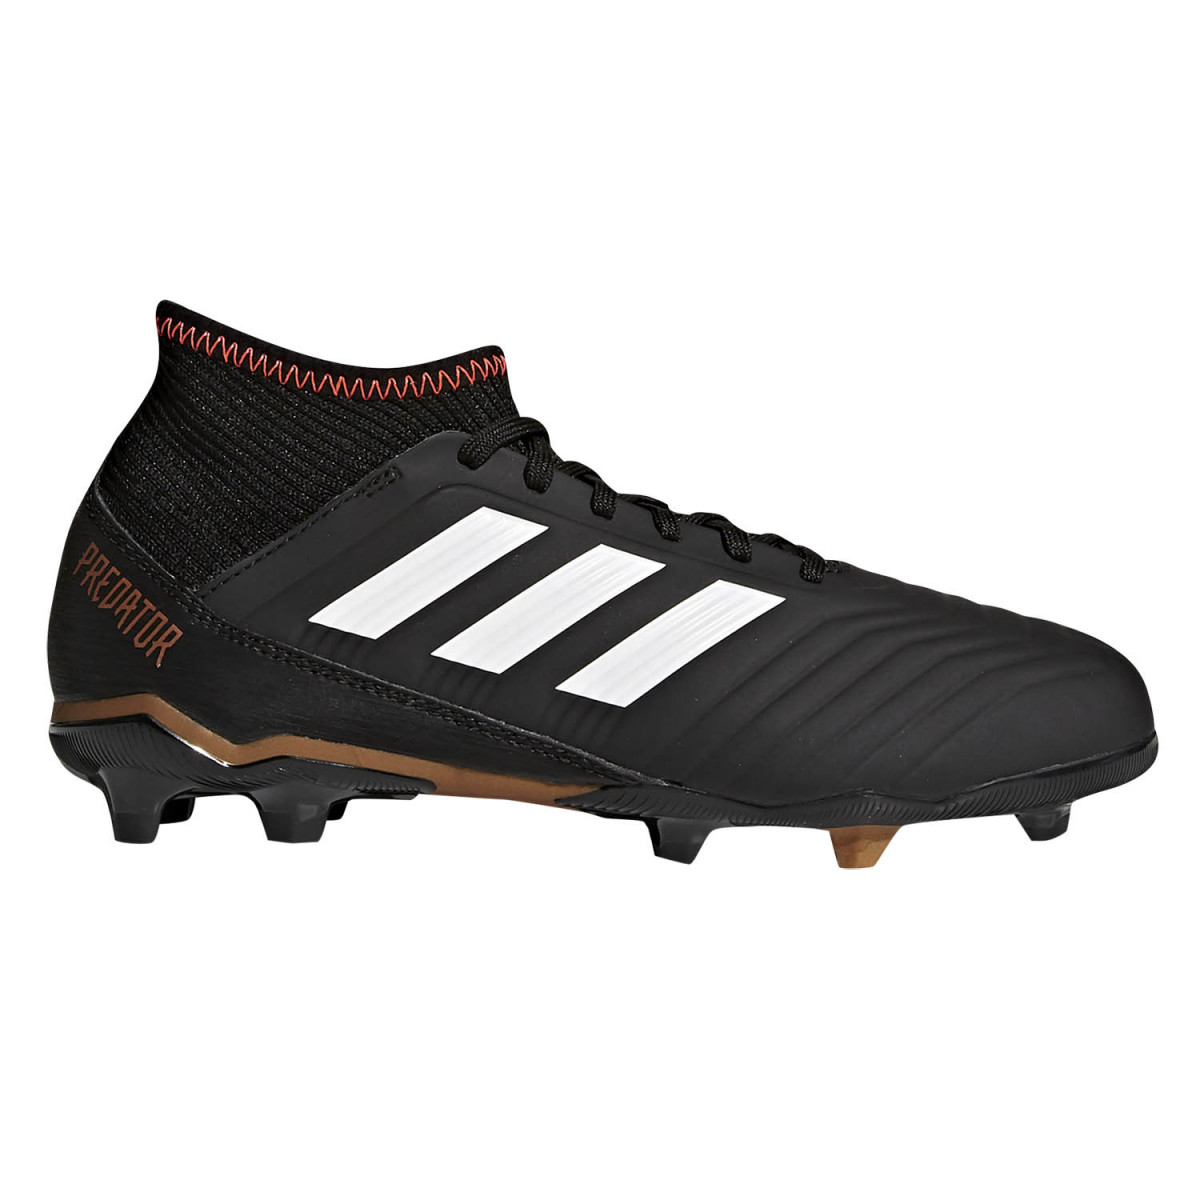 Botines Adidas Predator 18.3 Fg - Botines - Oferta 56d4934d981cc